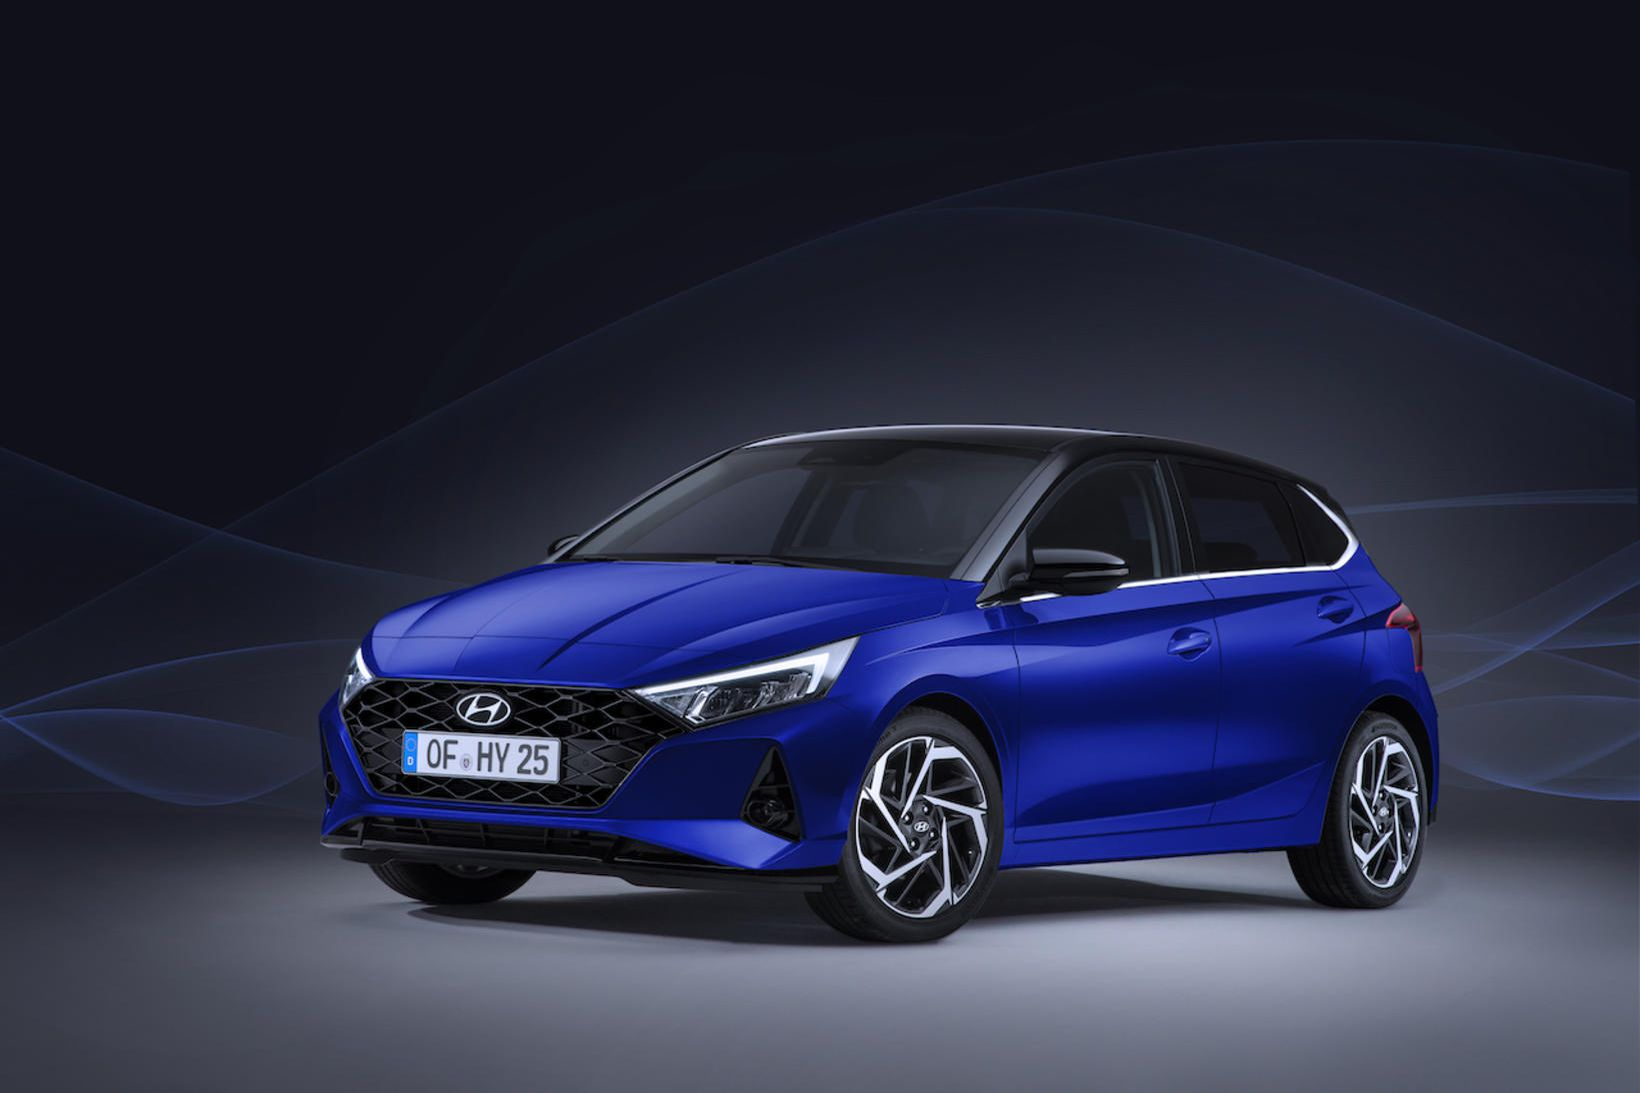 Hinn nýi Hyundai i20.